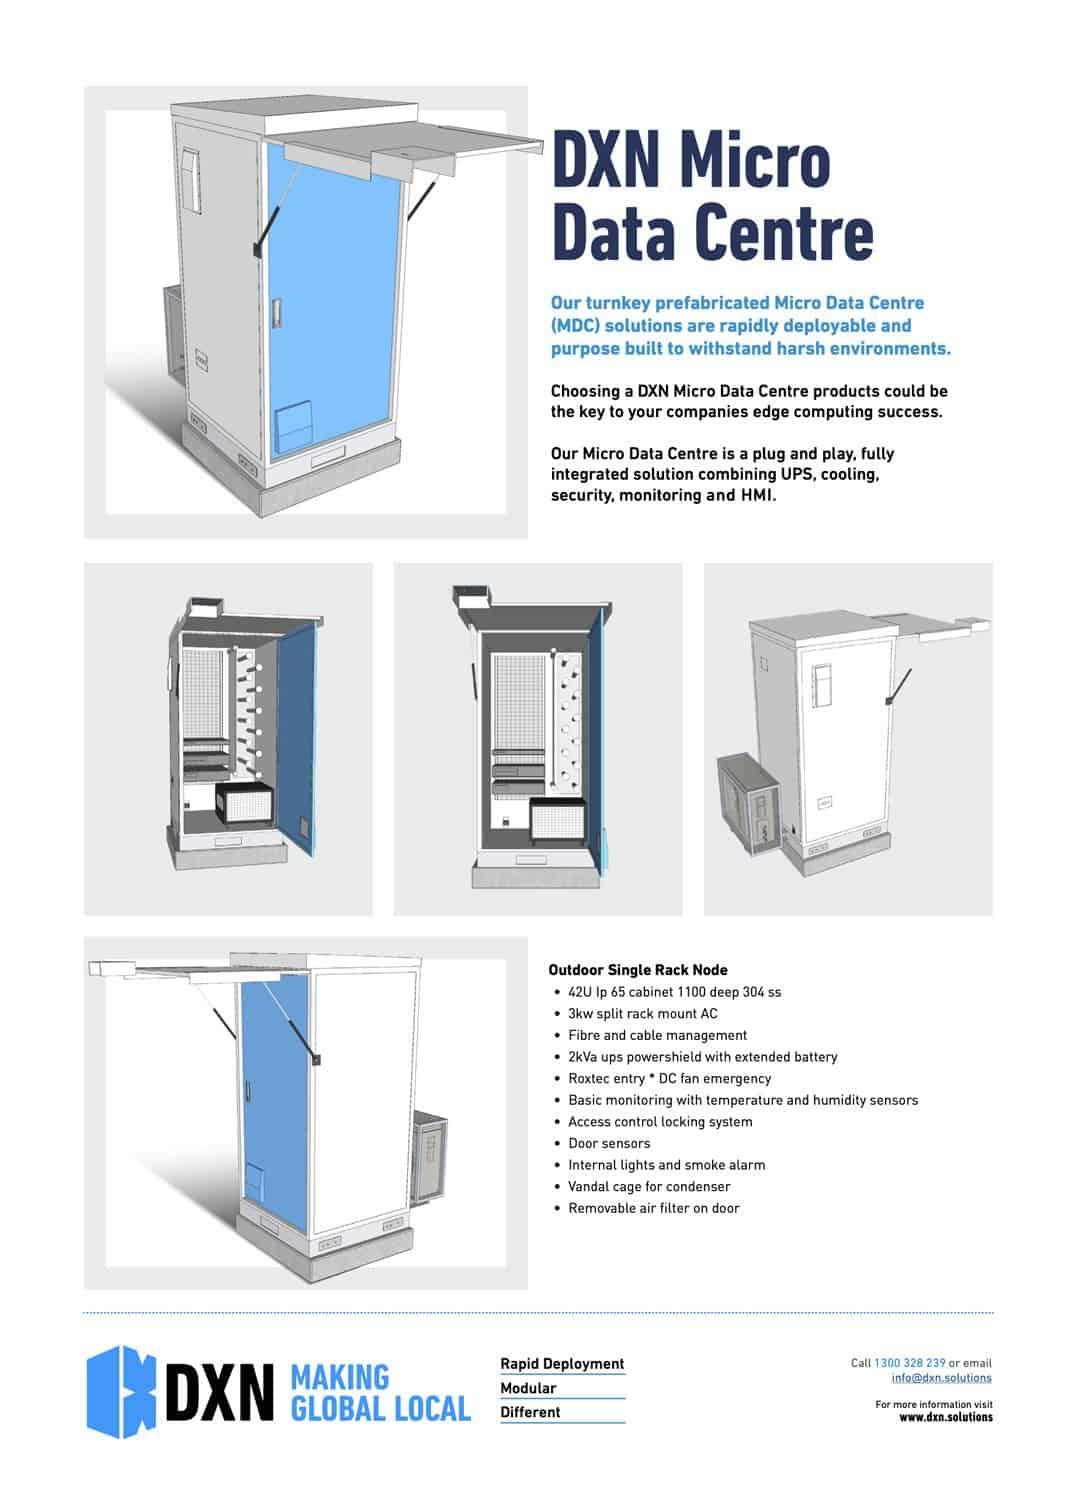 DXN Micro Data Centre